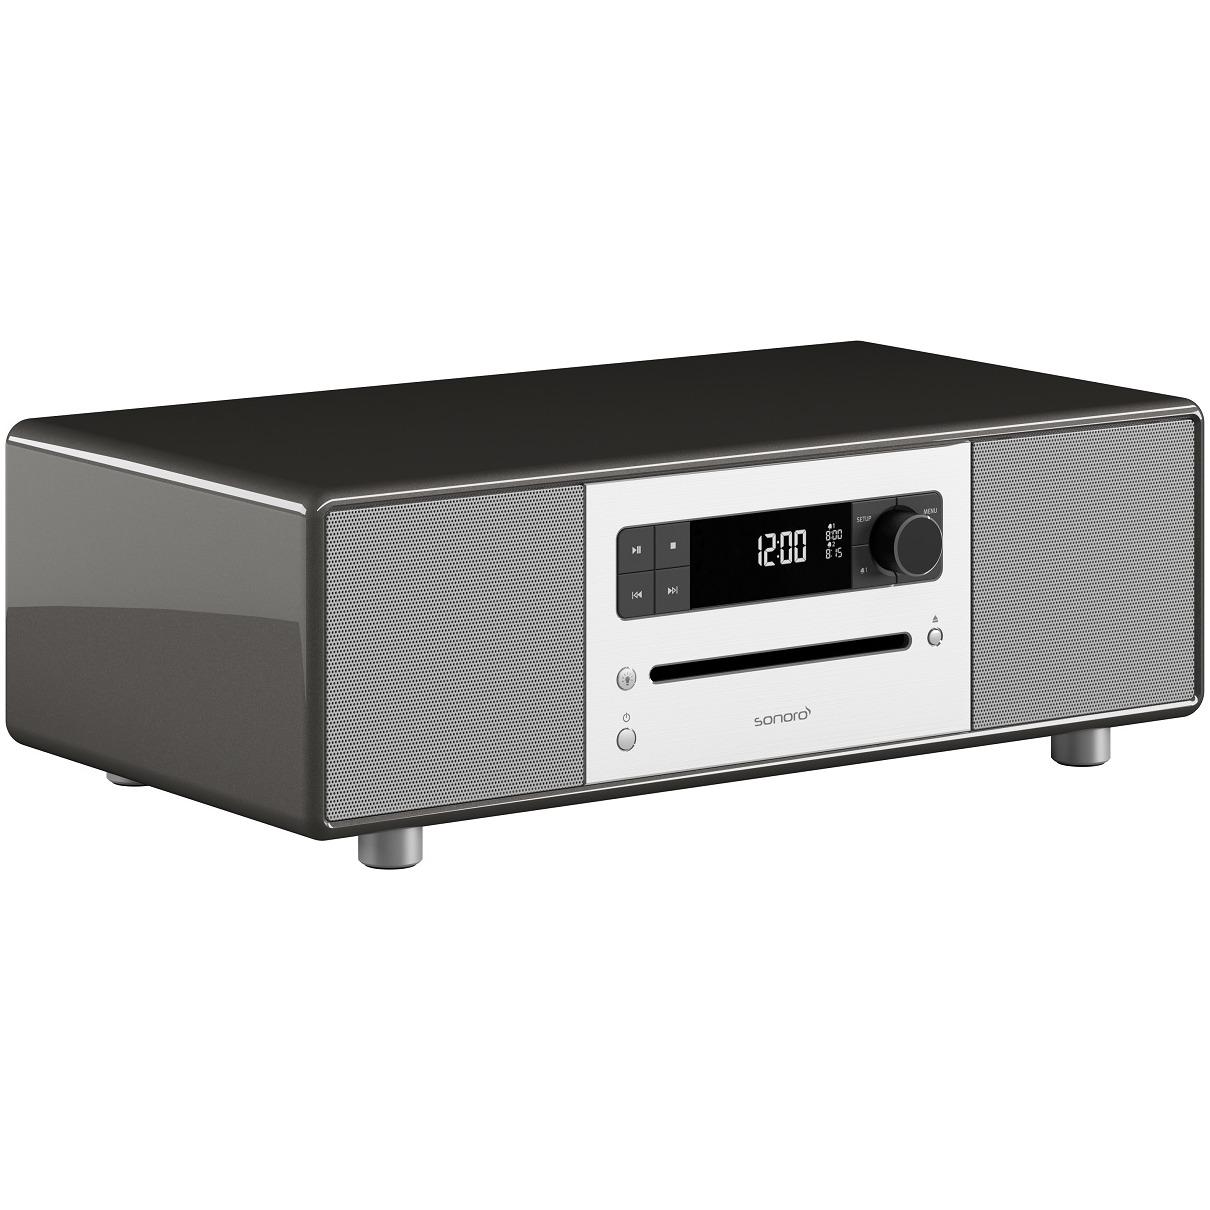 Sonoro stereo set Stereo 320 grafiet